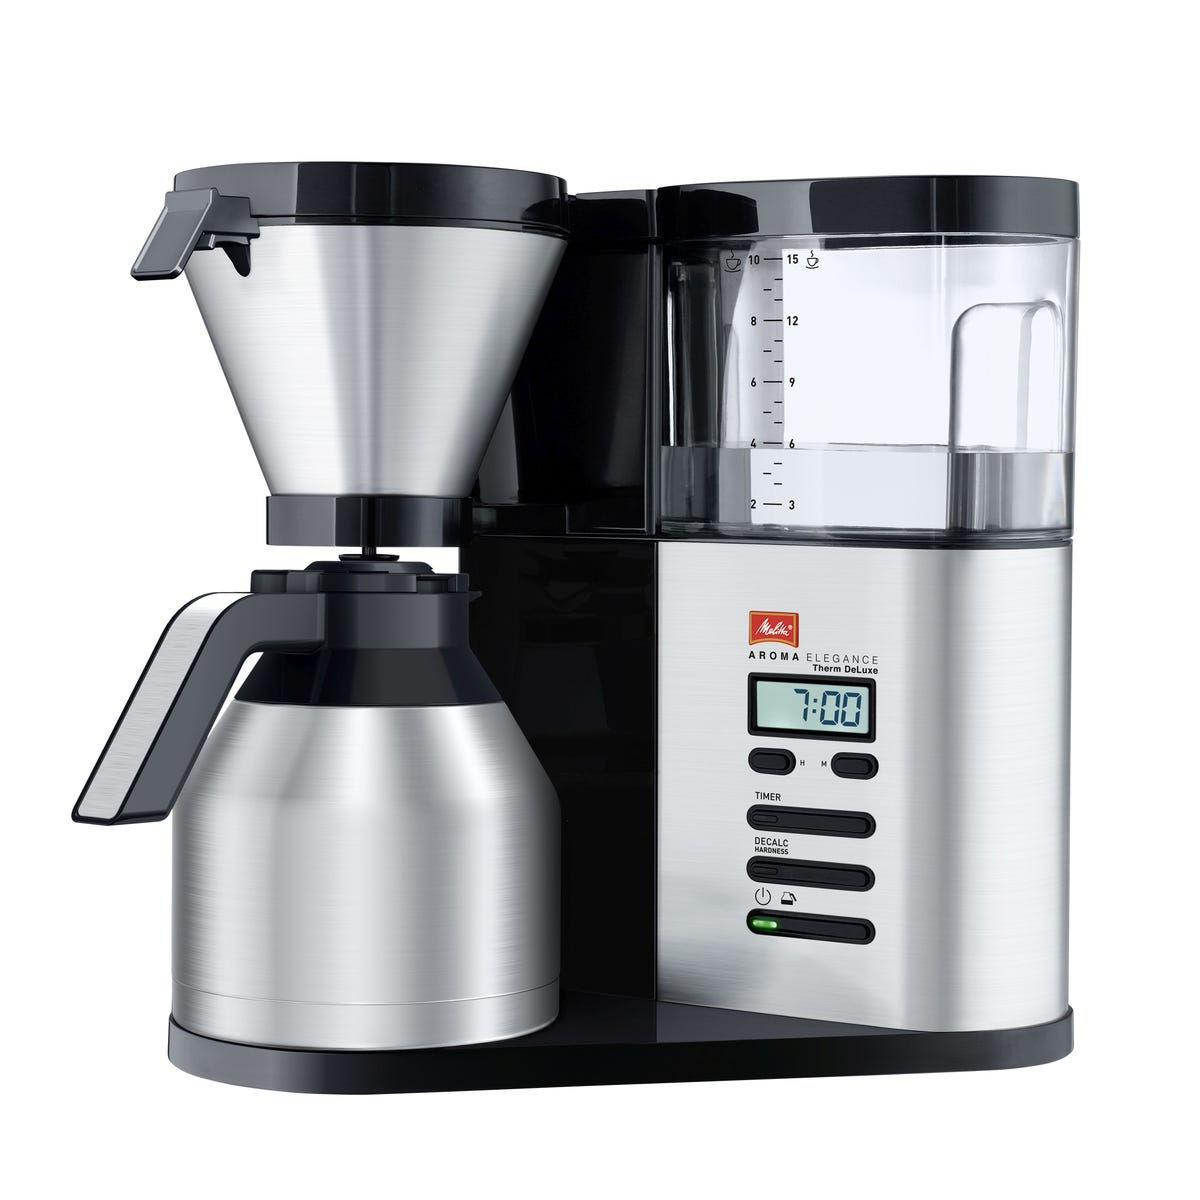 Melitta ML8112 AromaElegance Therm DeLuxe 1800W Filter Coffee Machine - Black